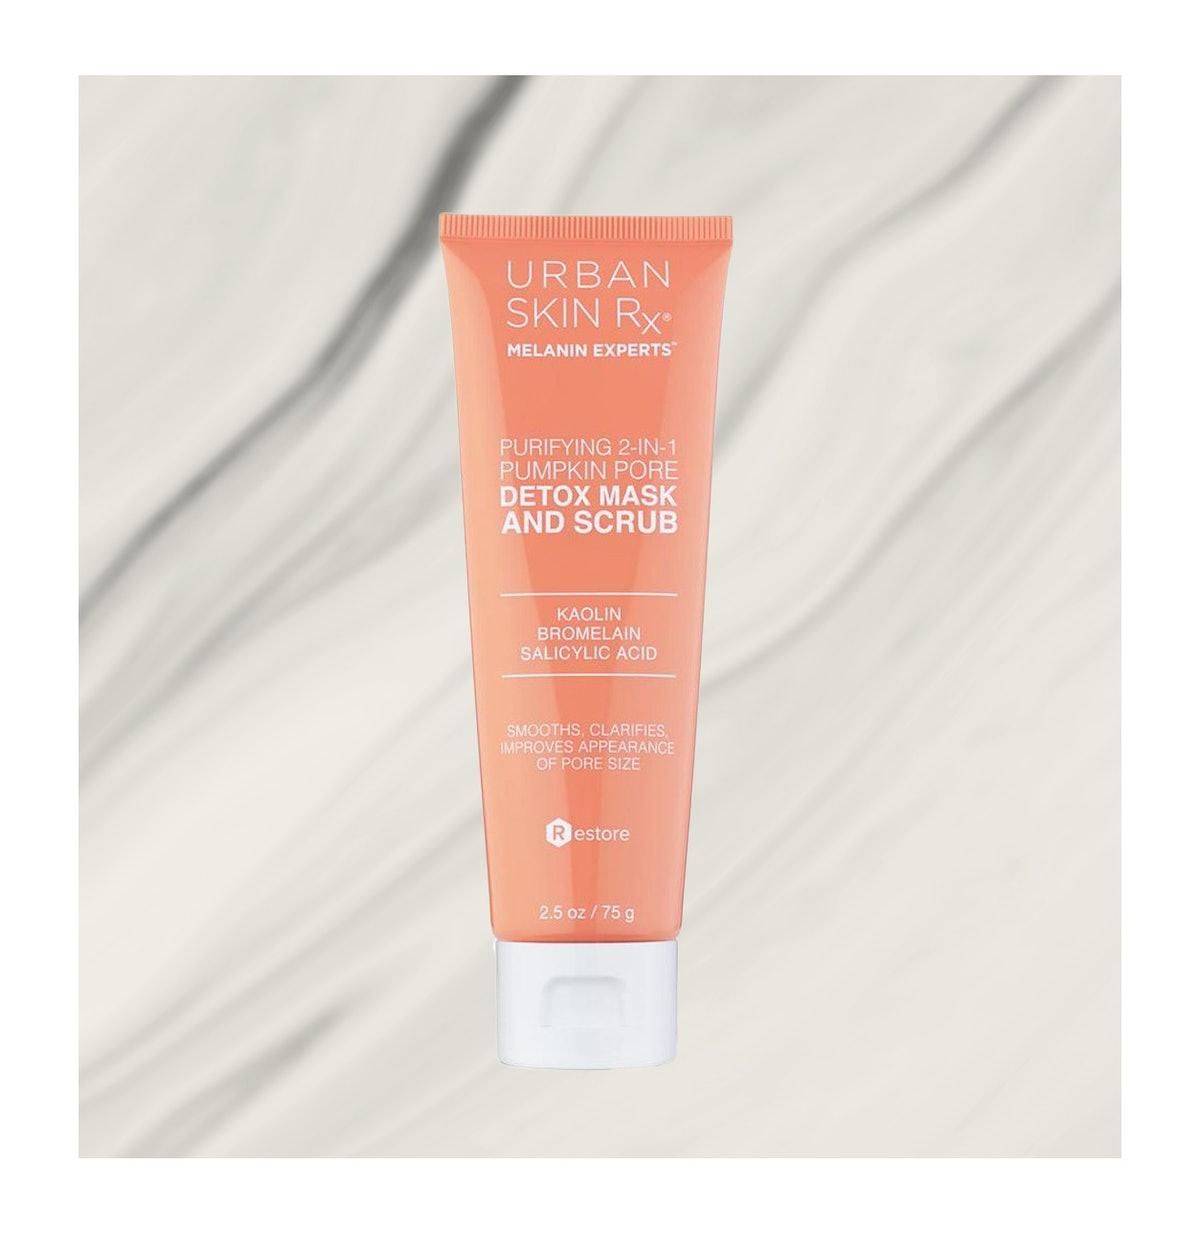 Purifying 2-in-1 Pumpkin Pore Detox Mask & Scrub